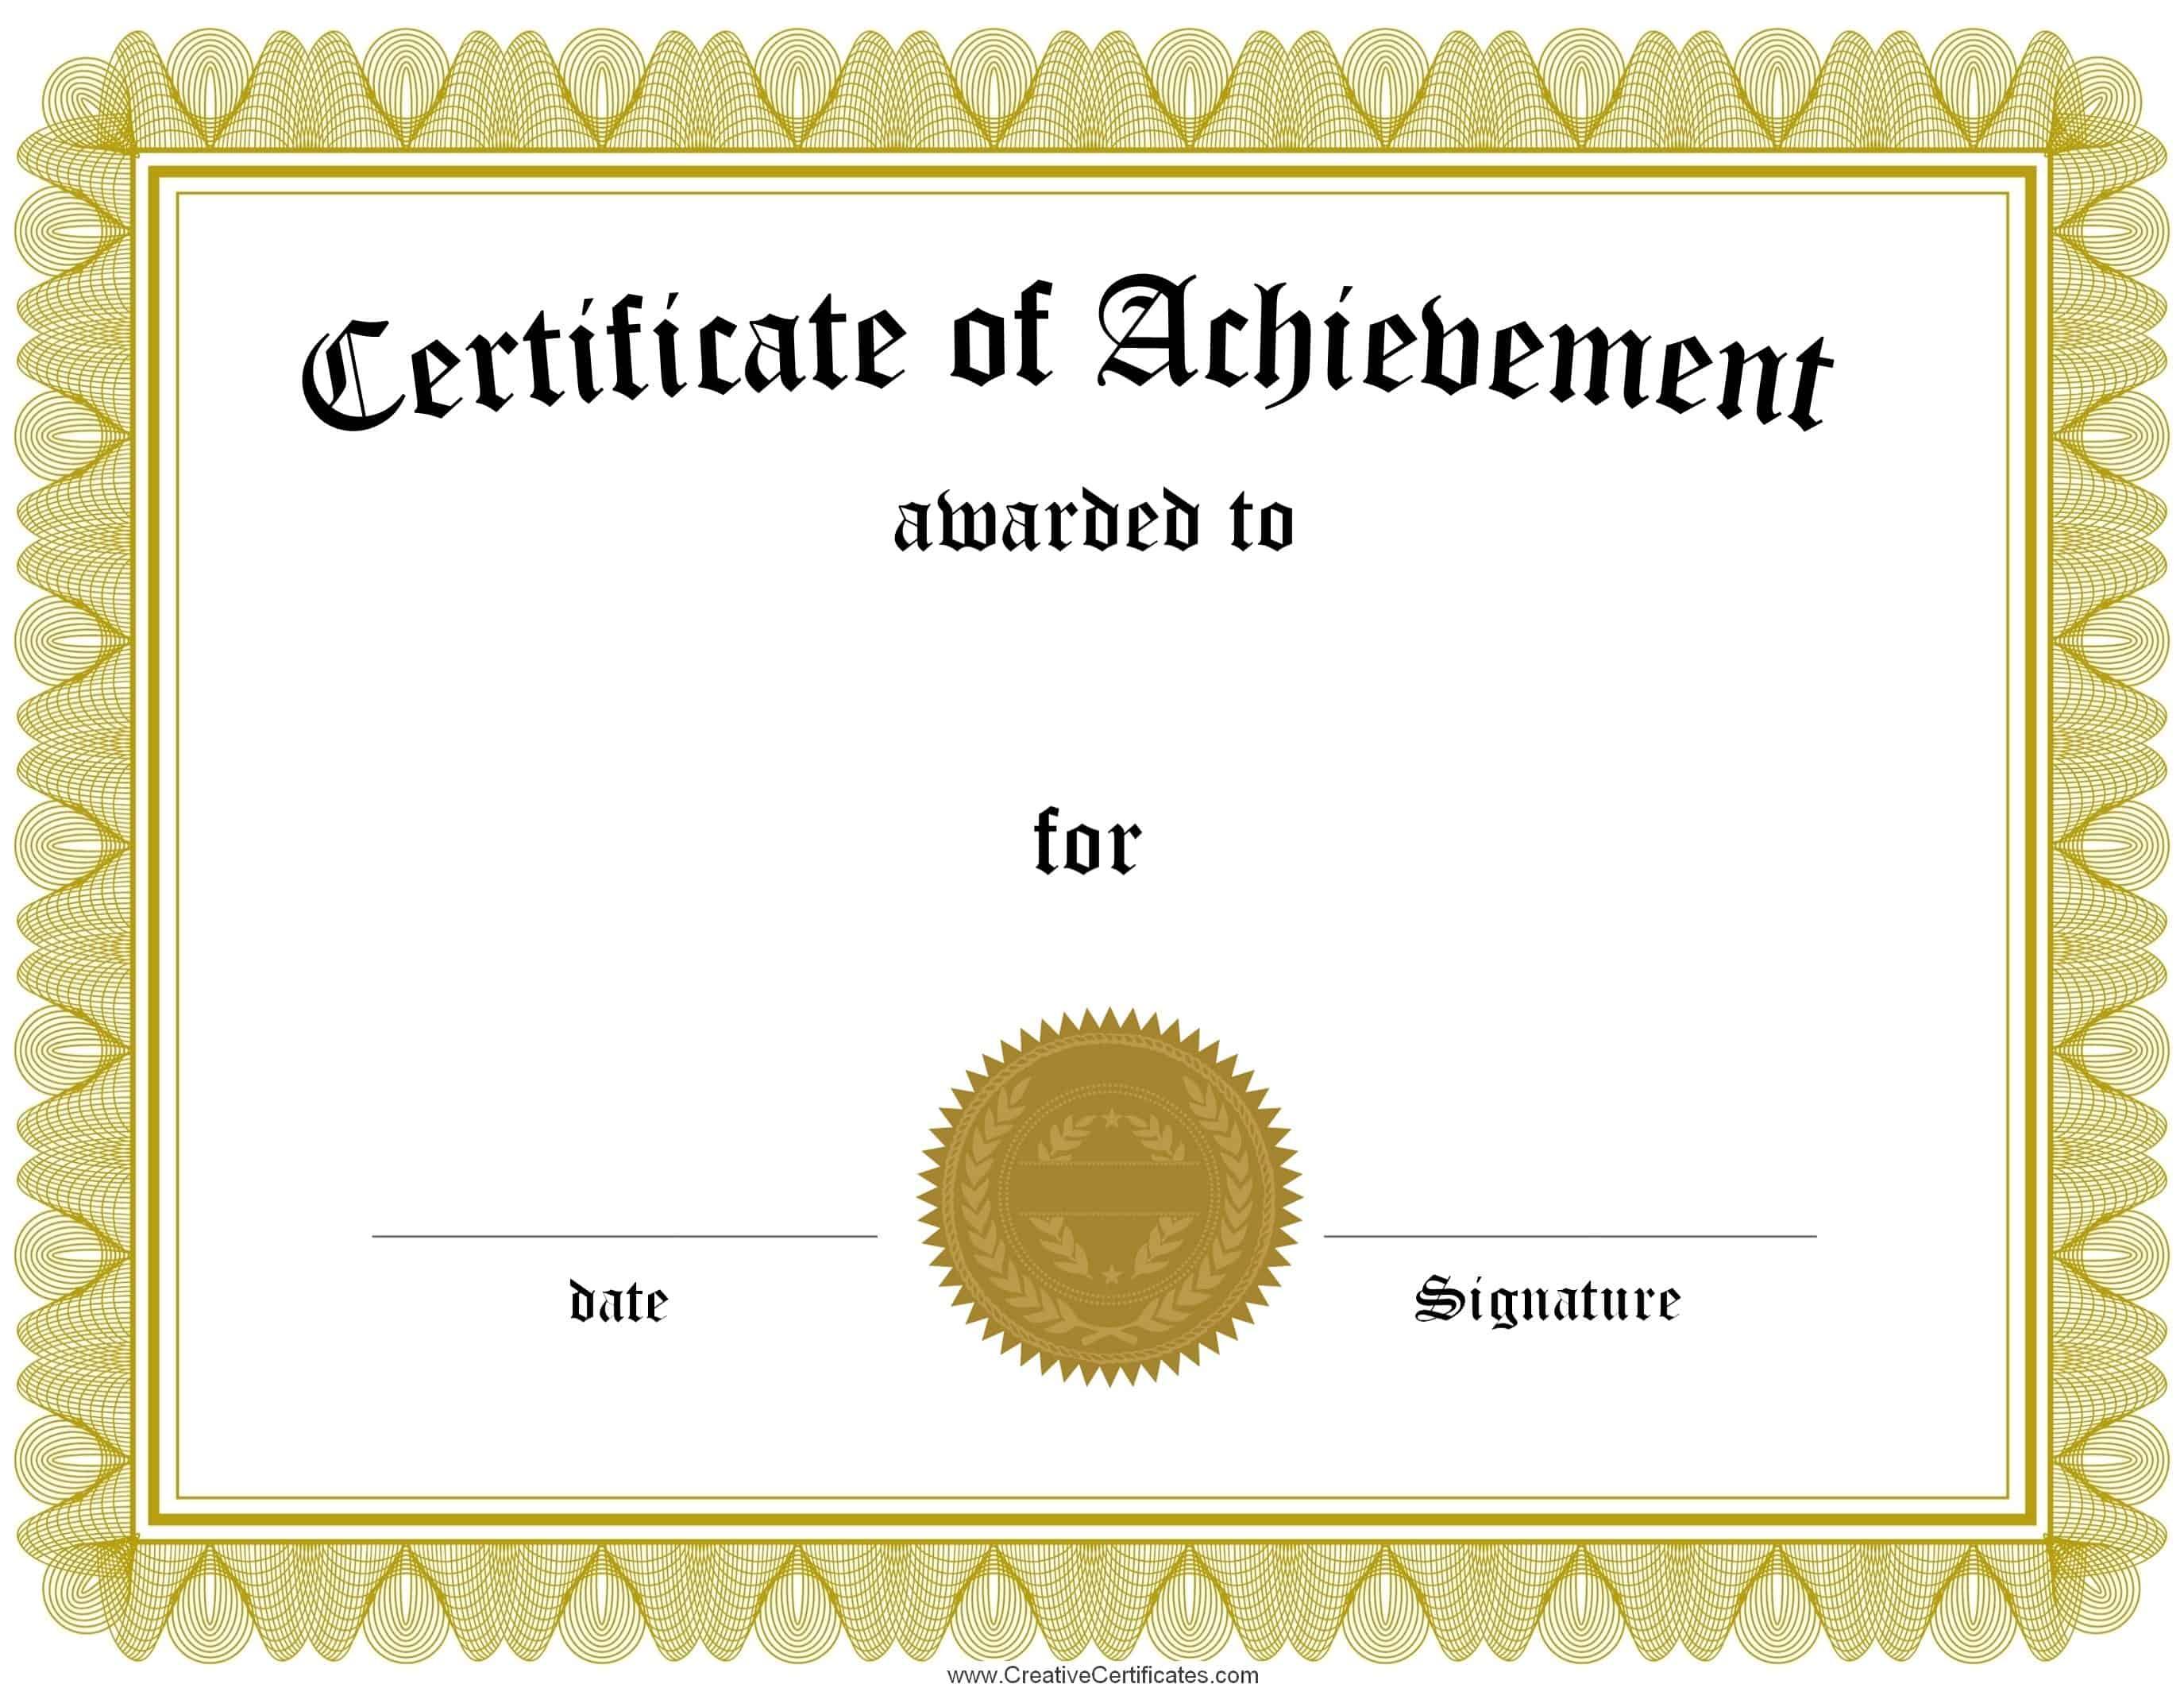 001 Free Printable Certificates Of Achievement Certificate Template - Free Customizable Printable Certificates Of Achievement